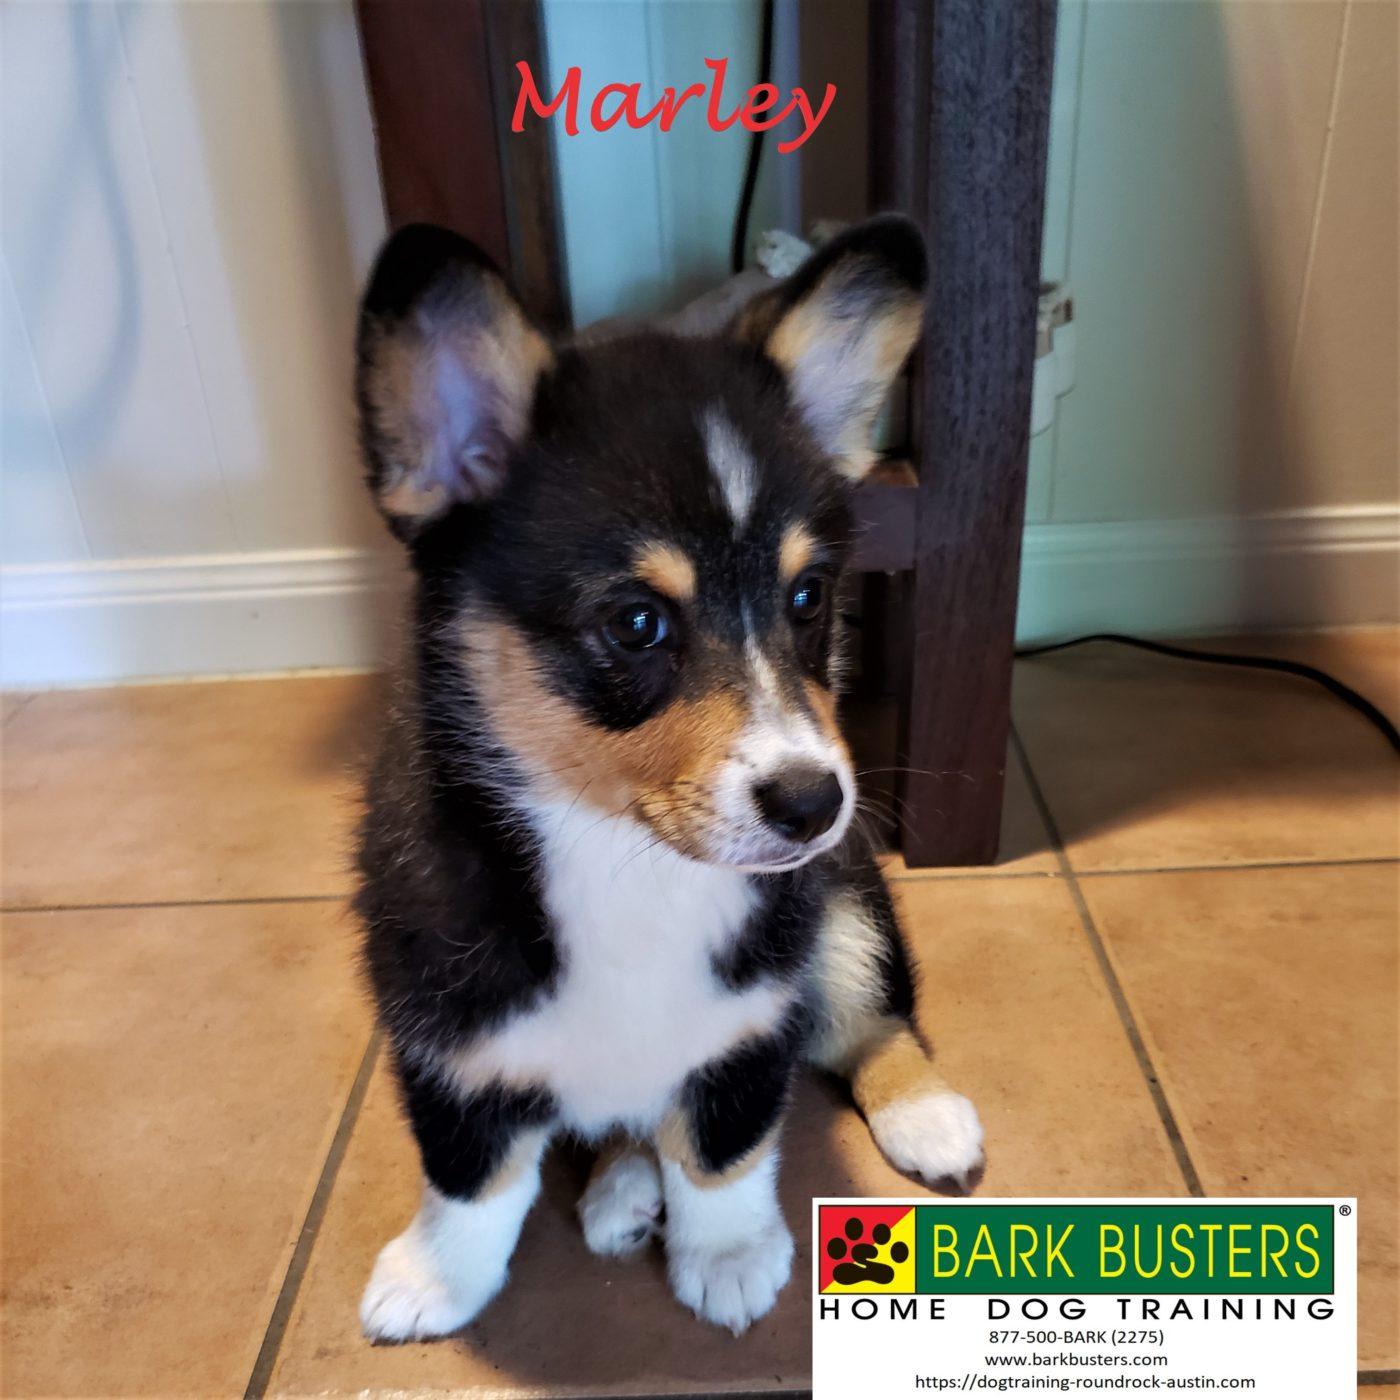 #puppytraining #corgi #dogtrainingeastaustin #dogsofbarkbusters #speakingdog